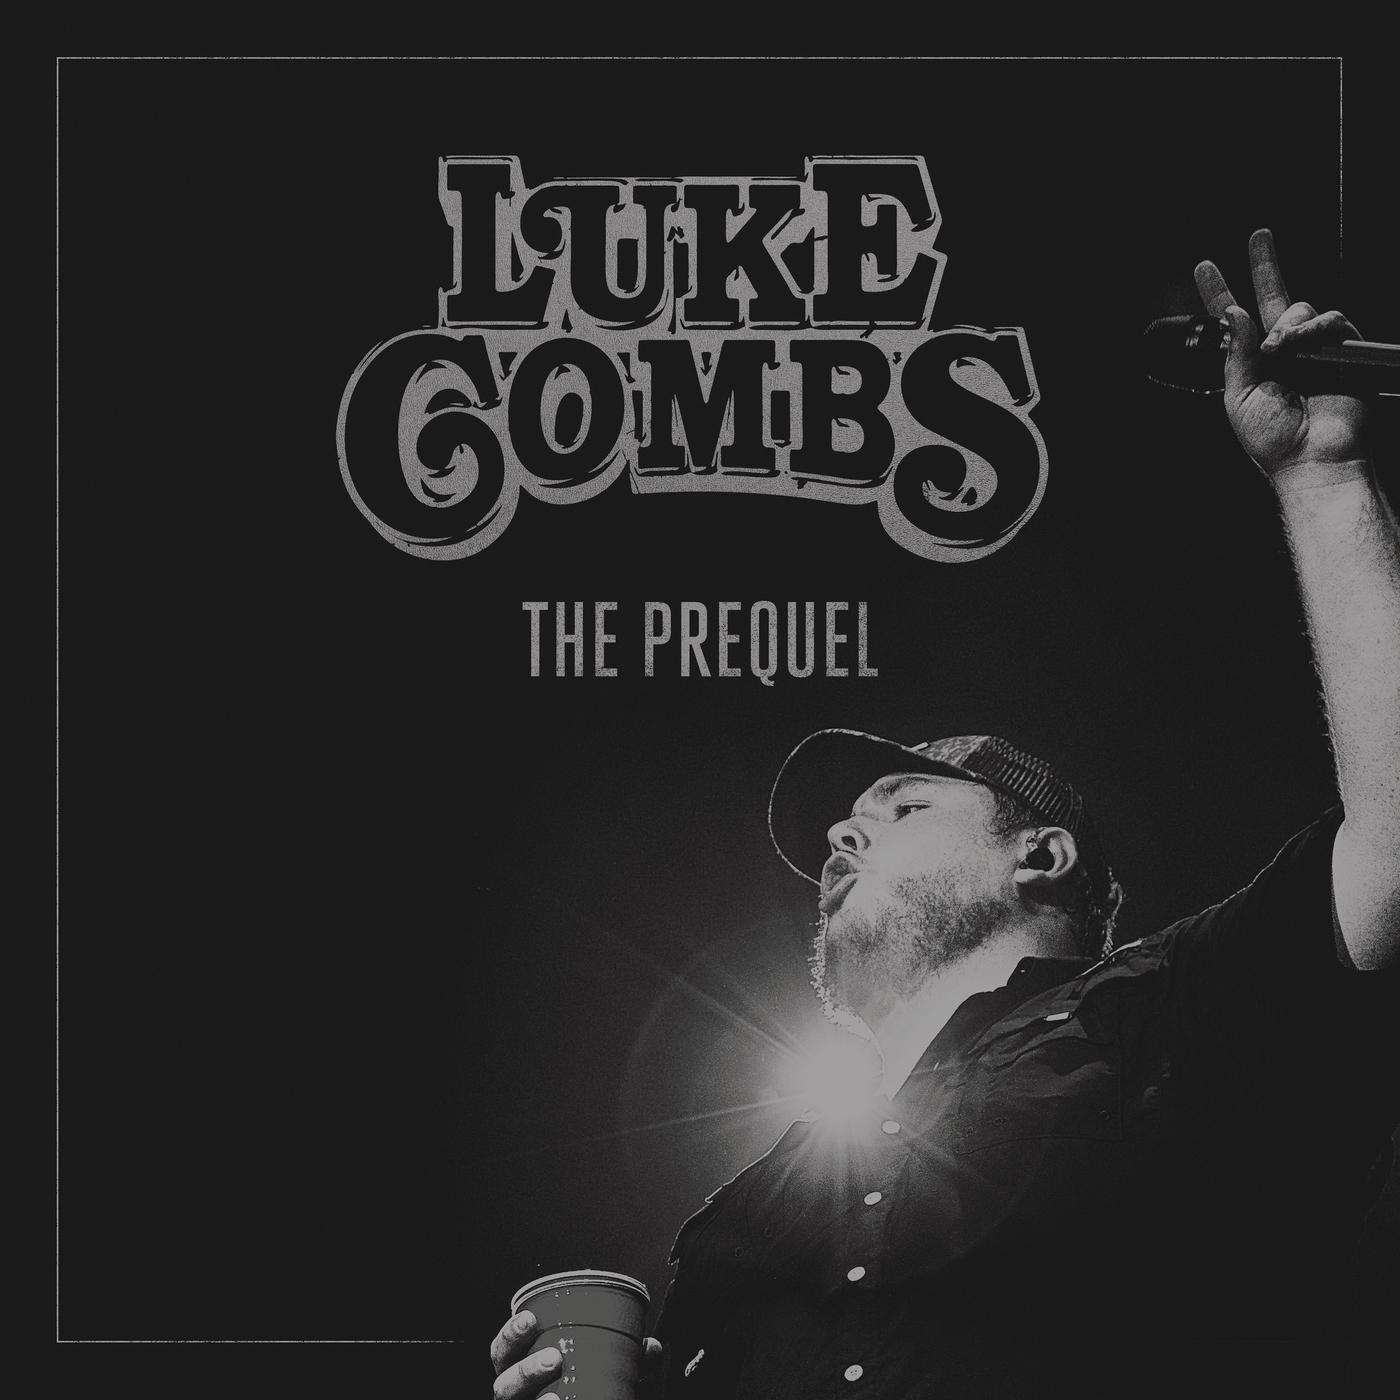 The Prequel - EP - Luke Combs